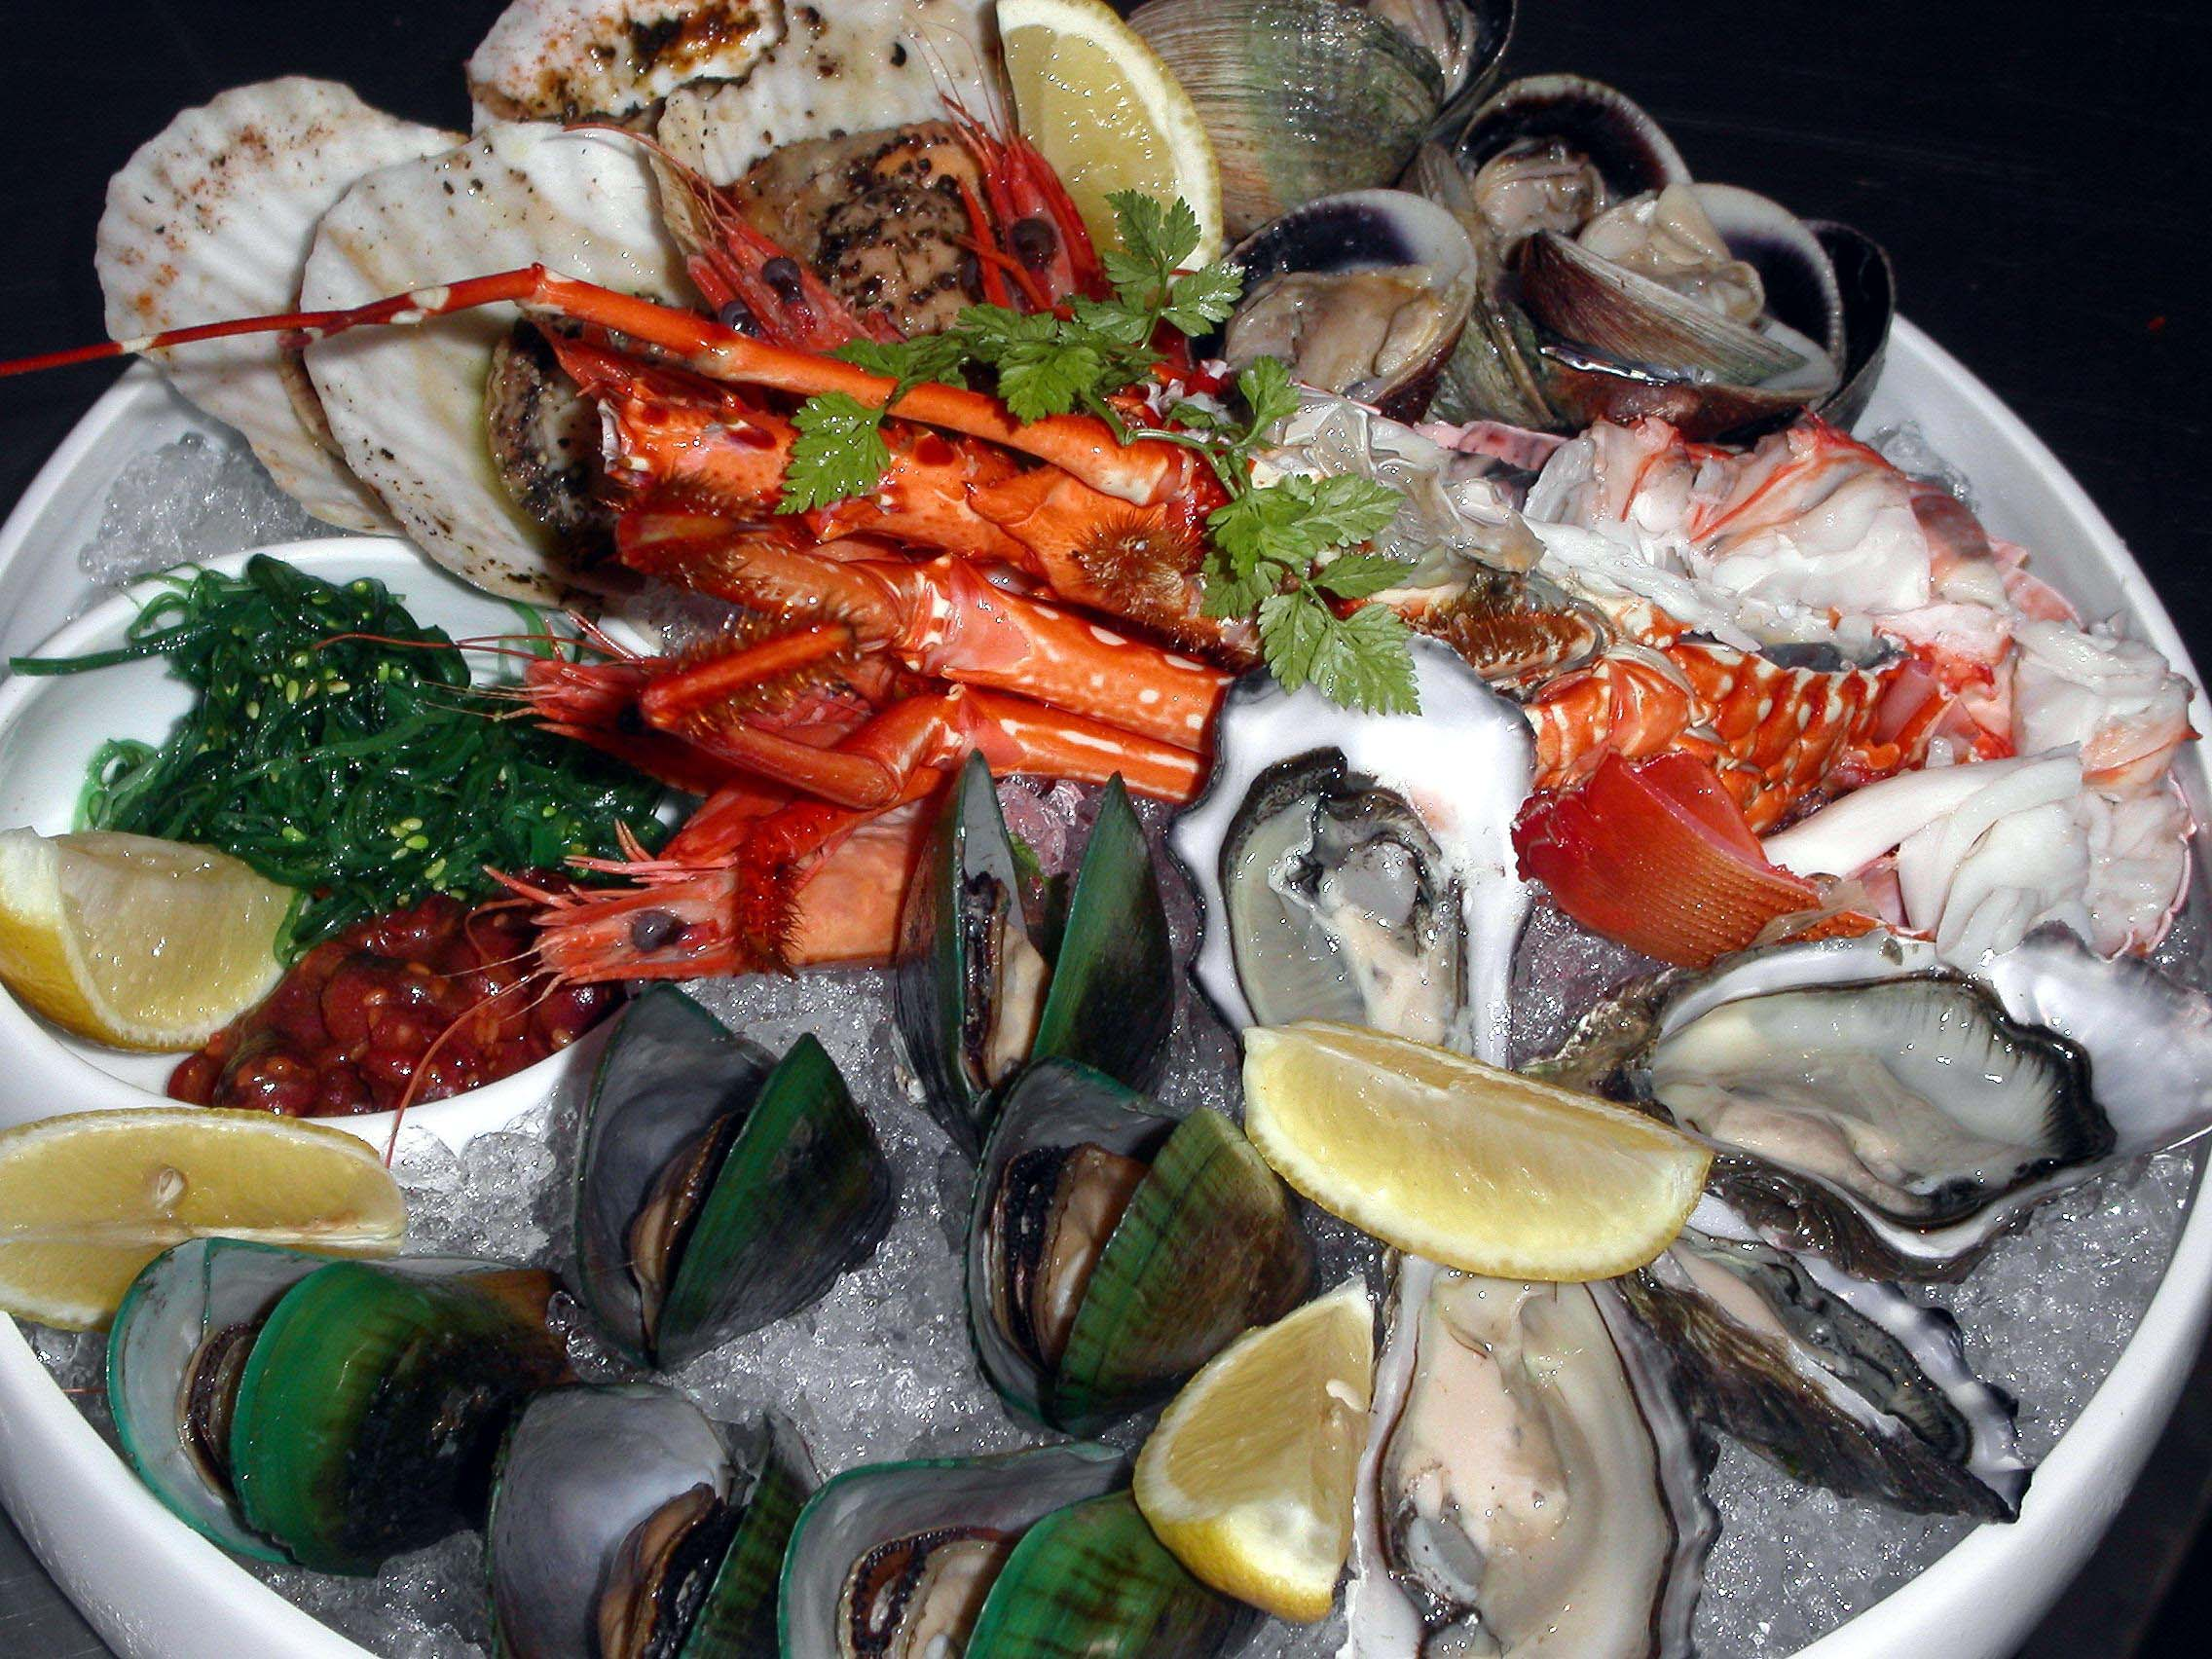 Fish tales singapore international seafood restaurant for Fish tales menu